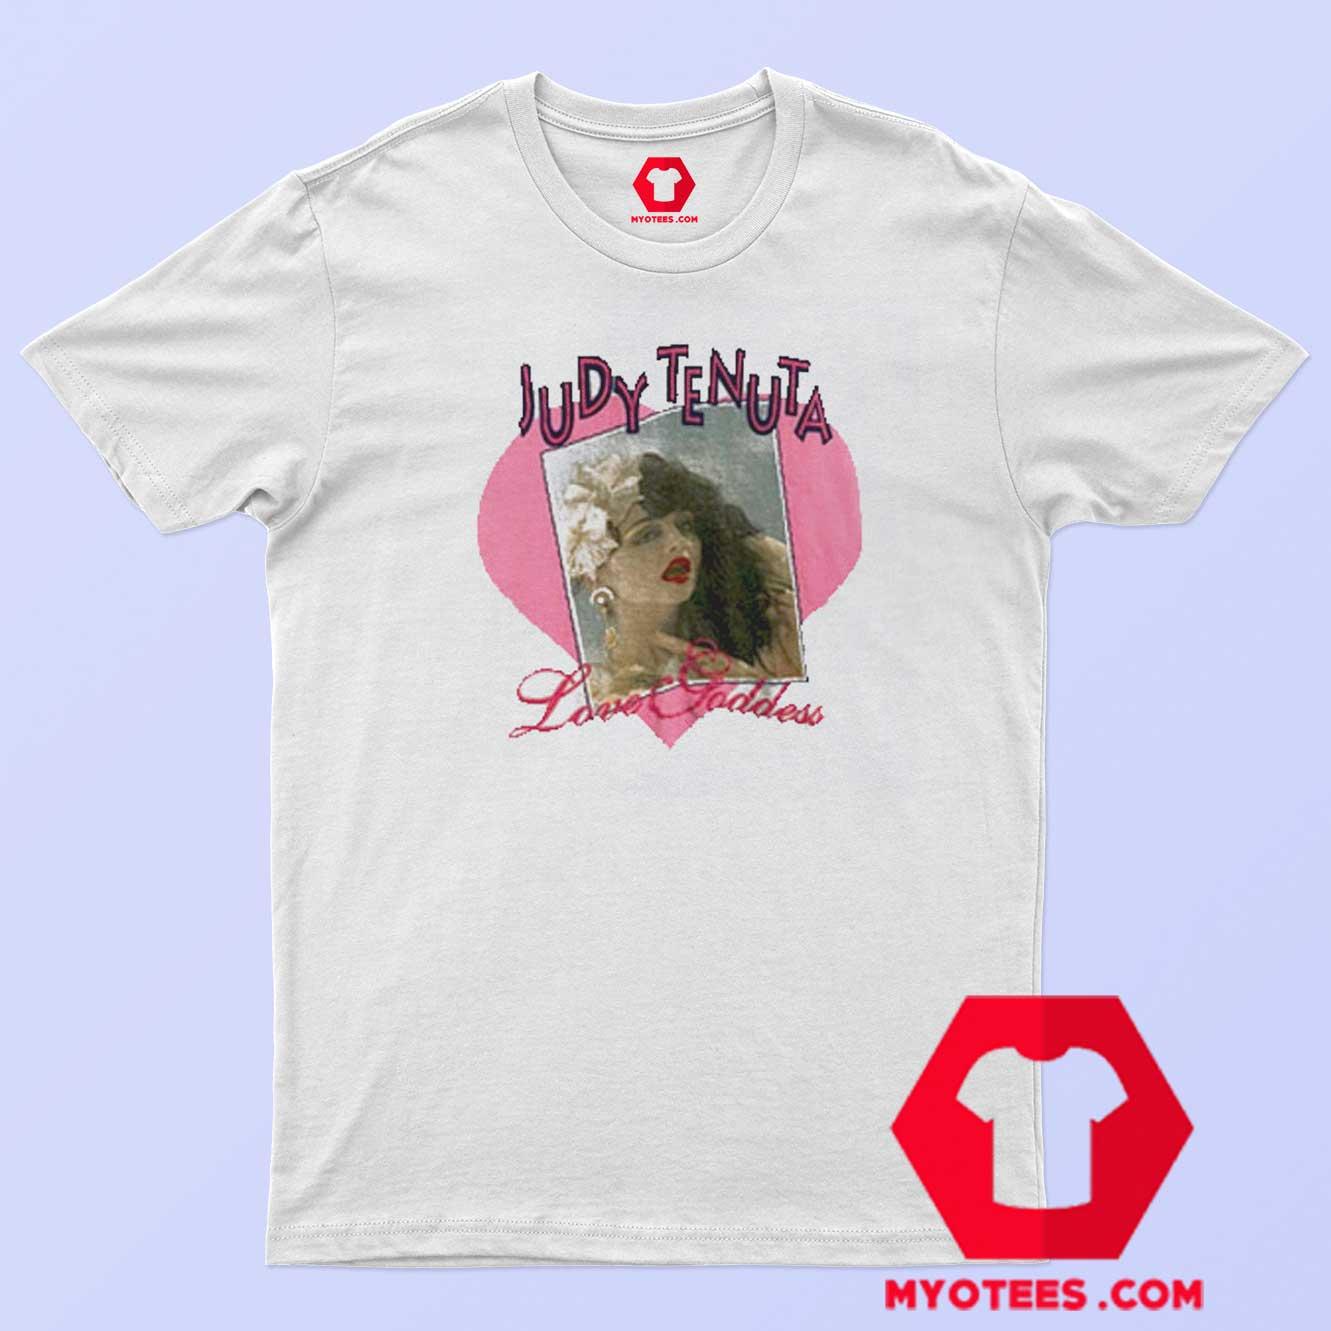 Judy Tenuta Desperation Boulevard T Shirt Myotees Com